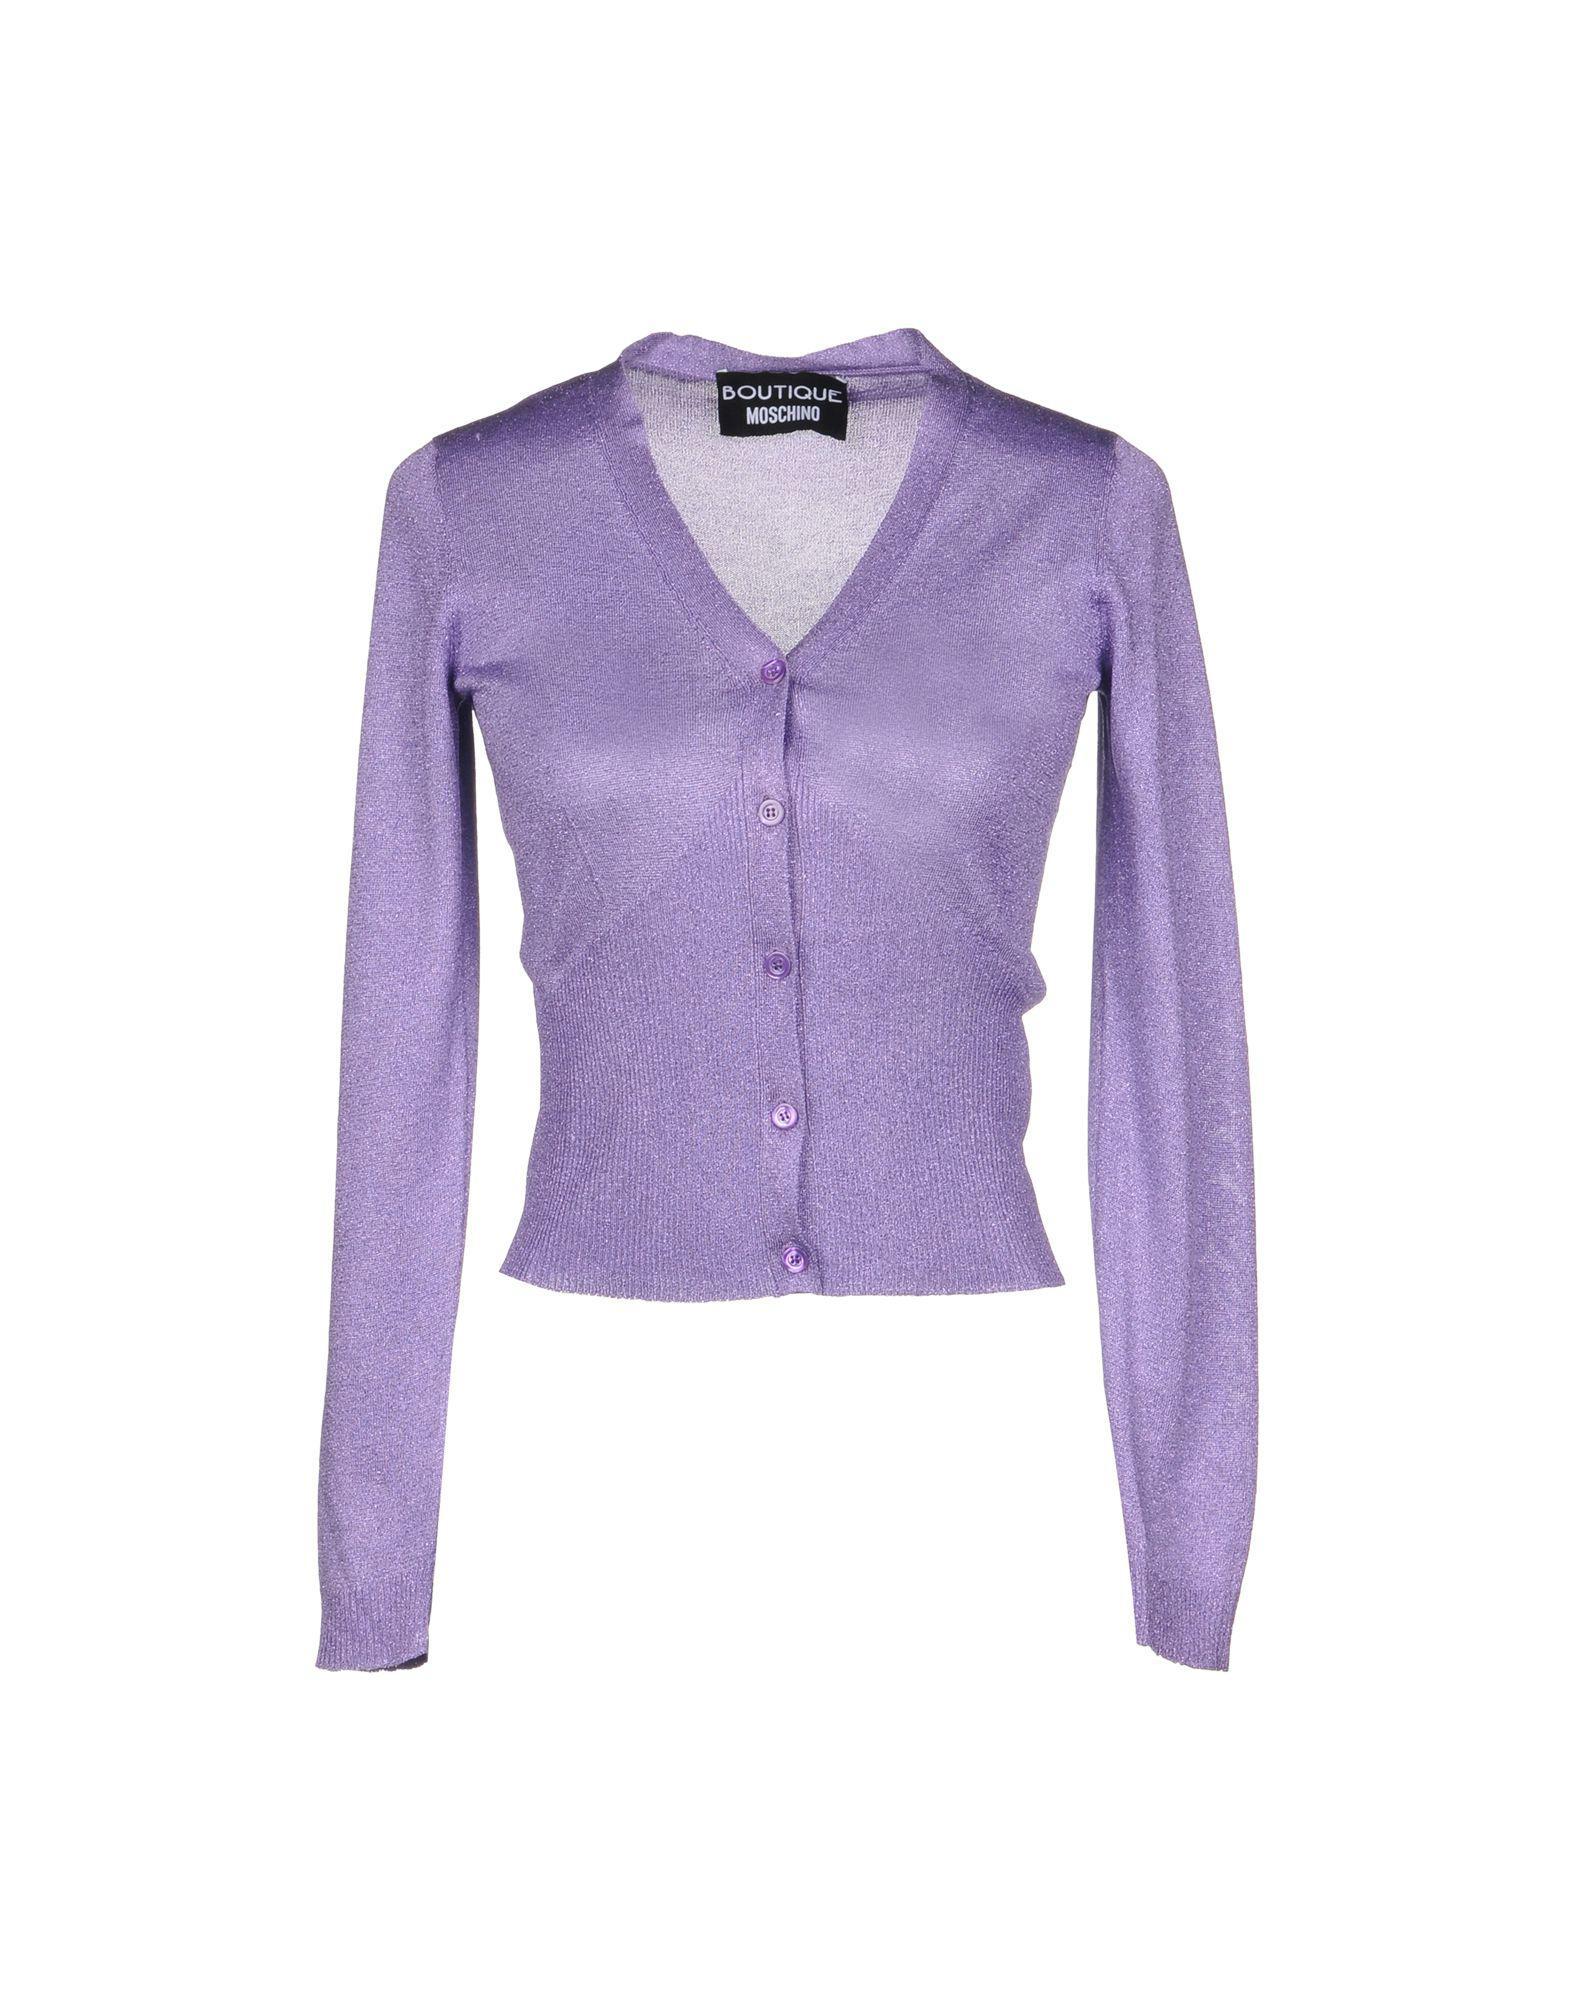 af2a1f16df1 Lyst - Boutique Moschino Cardigan in Purple